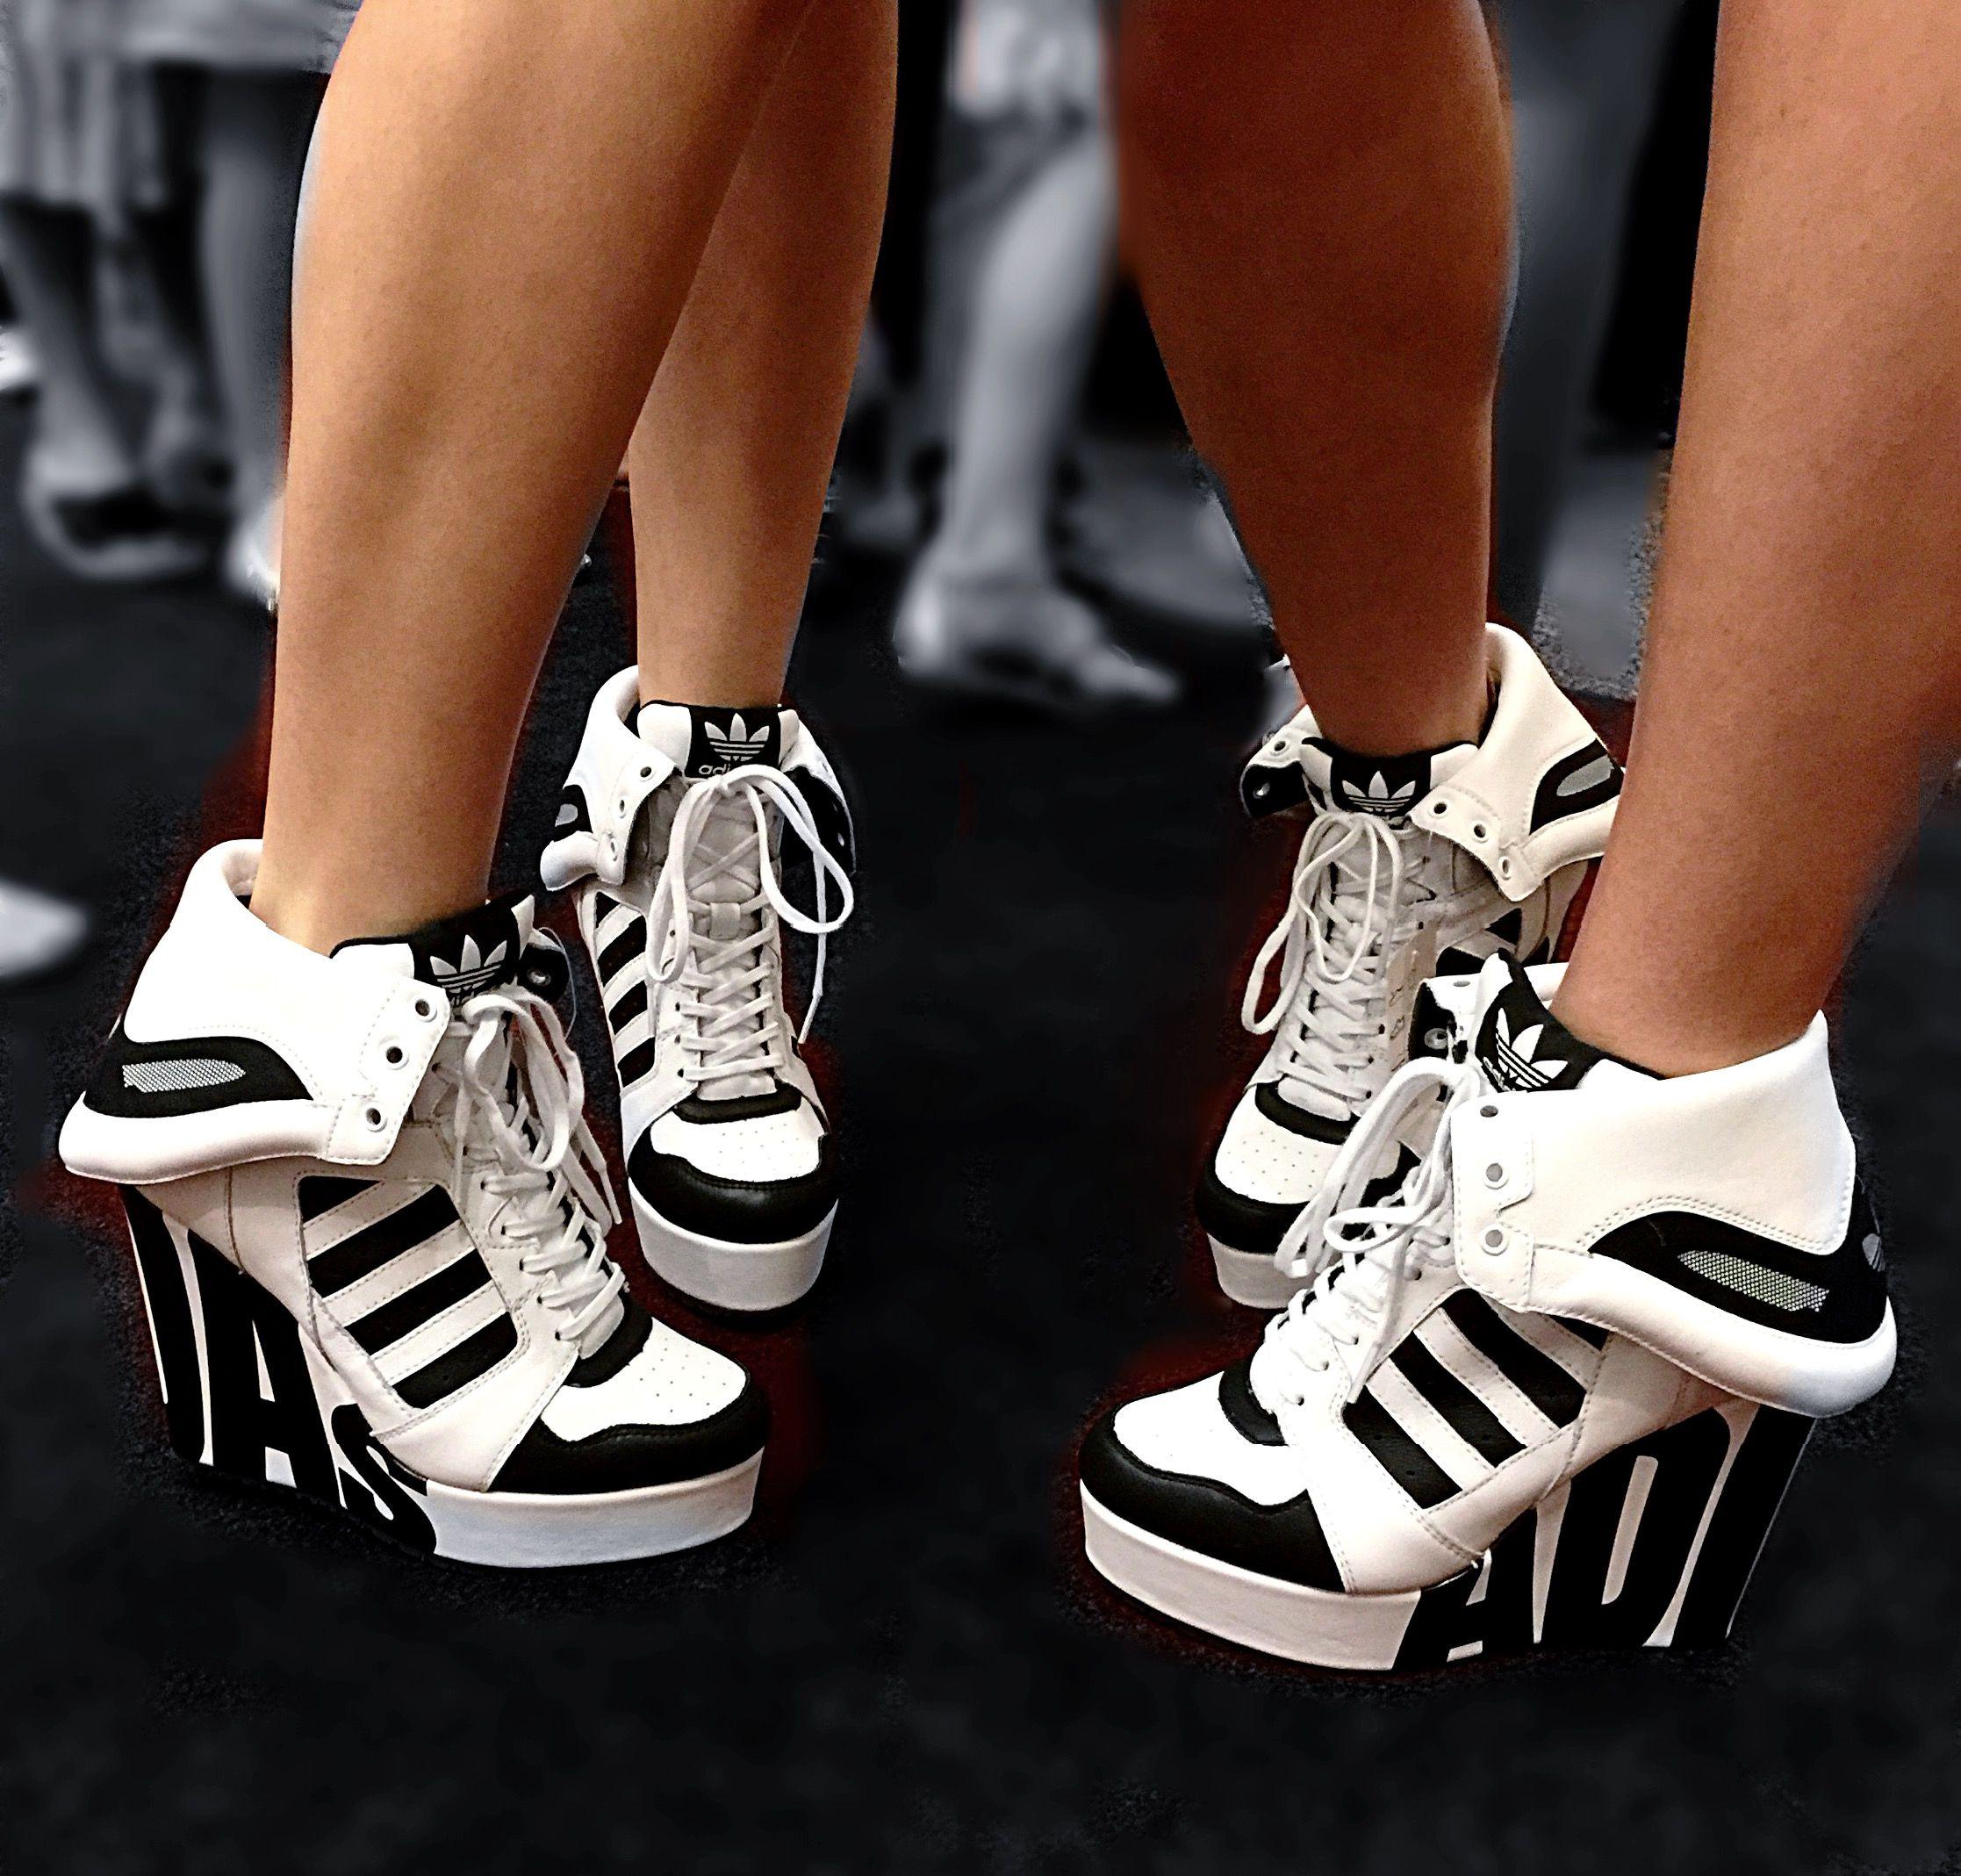 May 29:  These are  gymnastics coach approved high heels!  #adidas #highheels #gymnastics